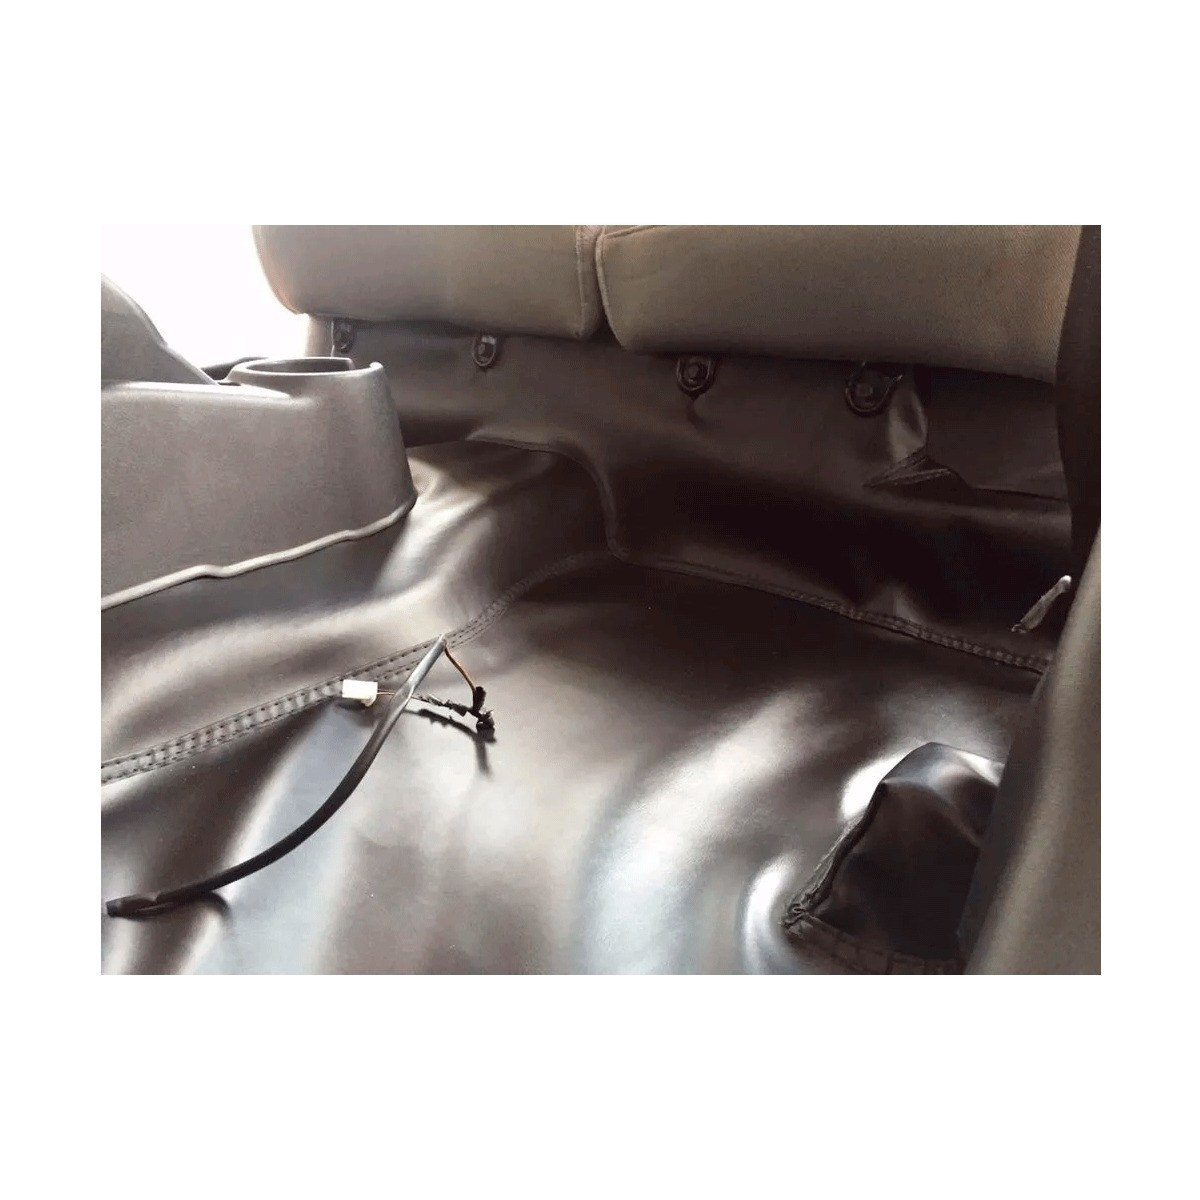 Tapete Automotivo Assoalho Emborrachado Bidim Volkswagen Amarok Simples 2010 a 2020